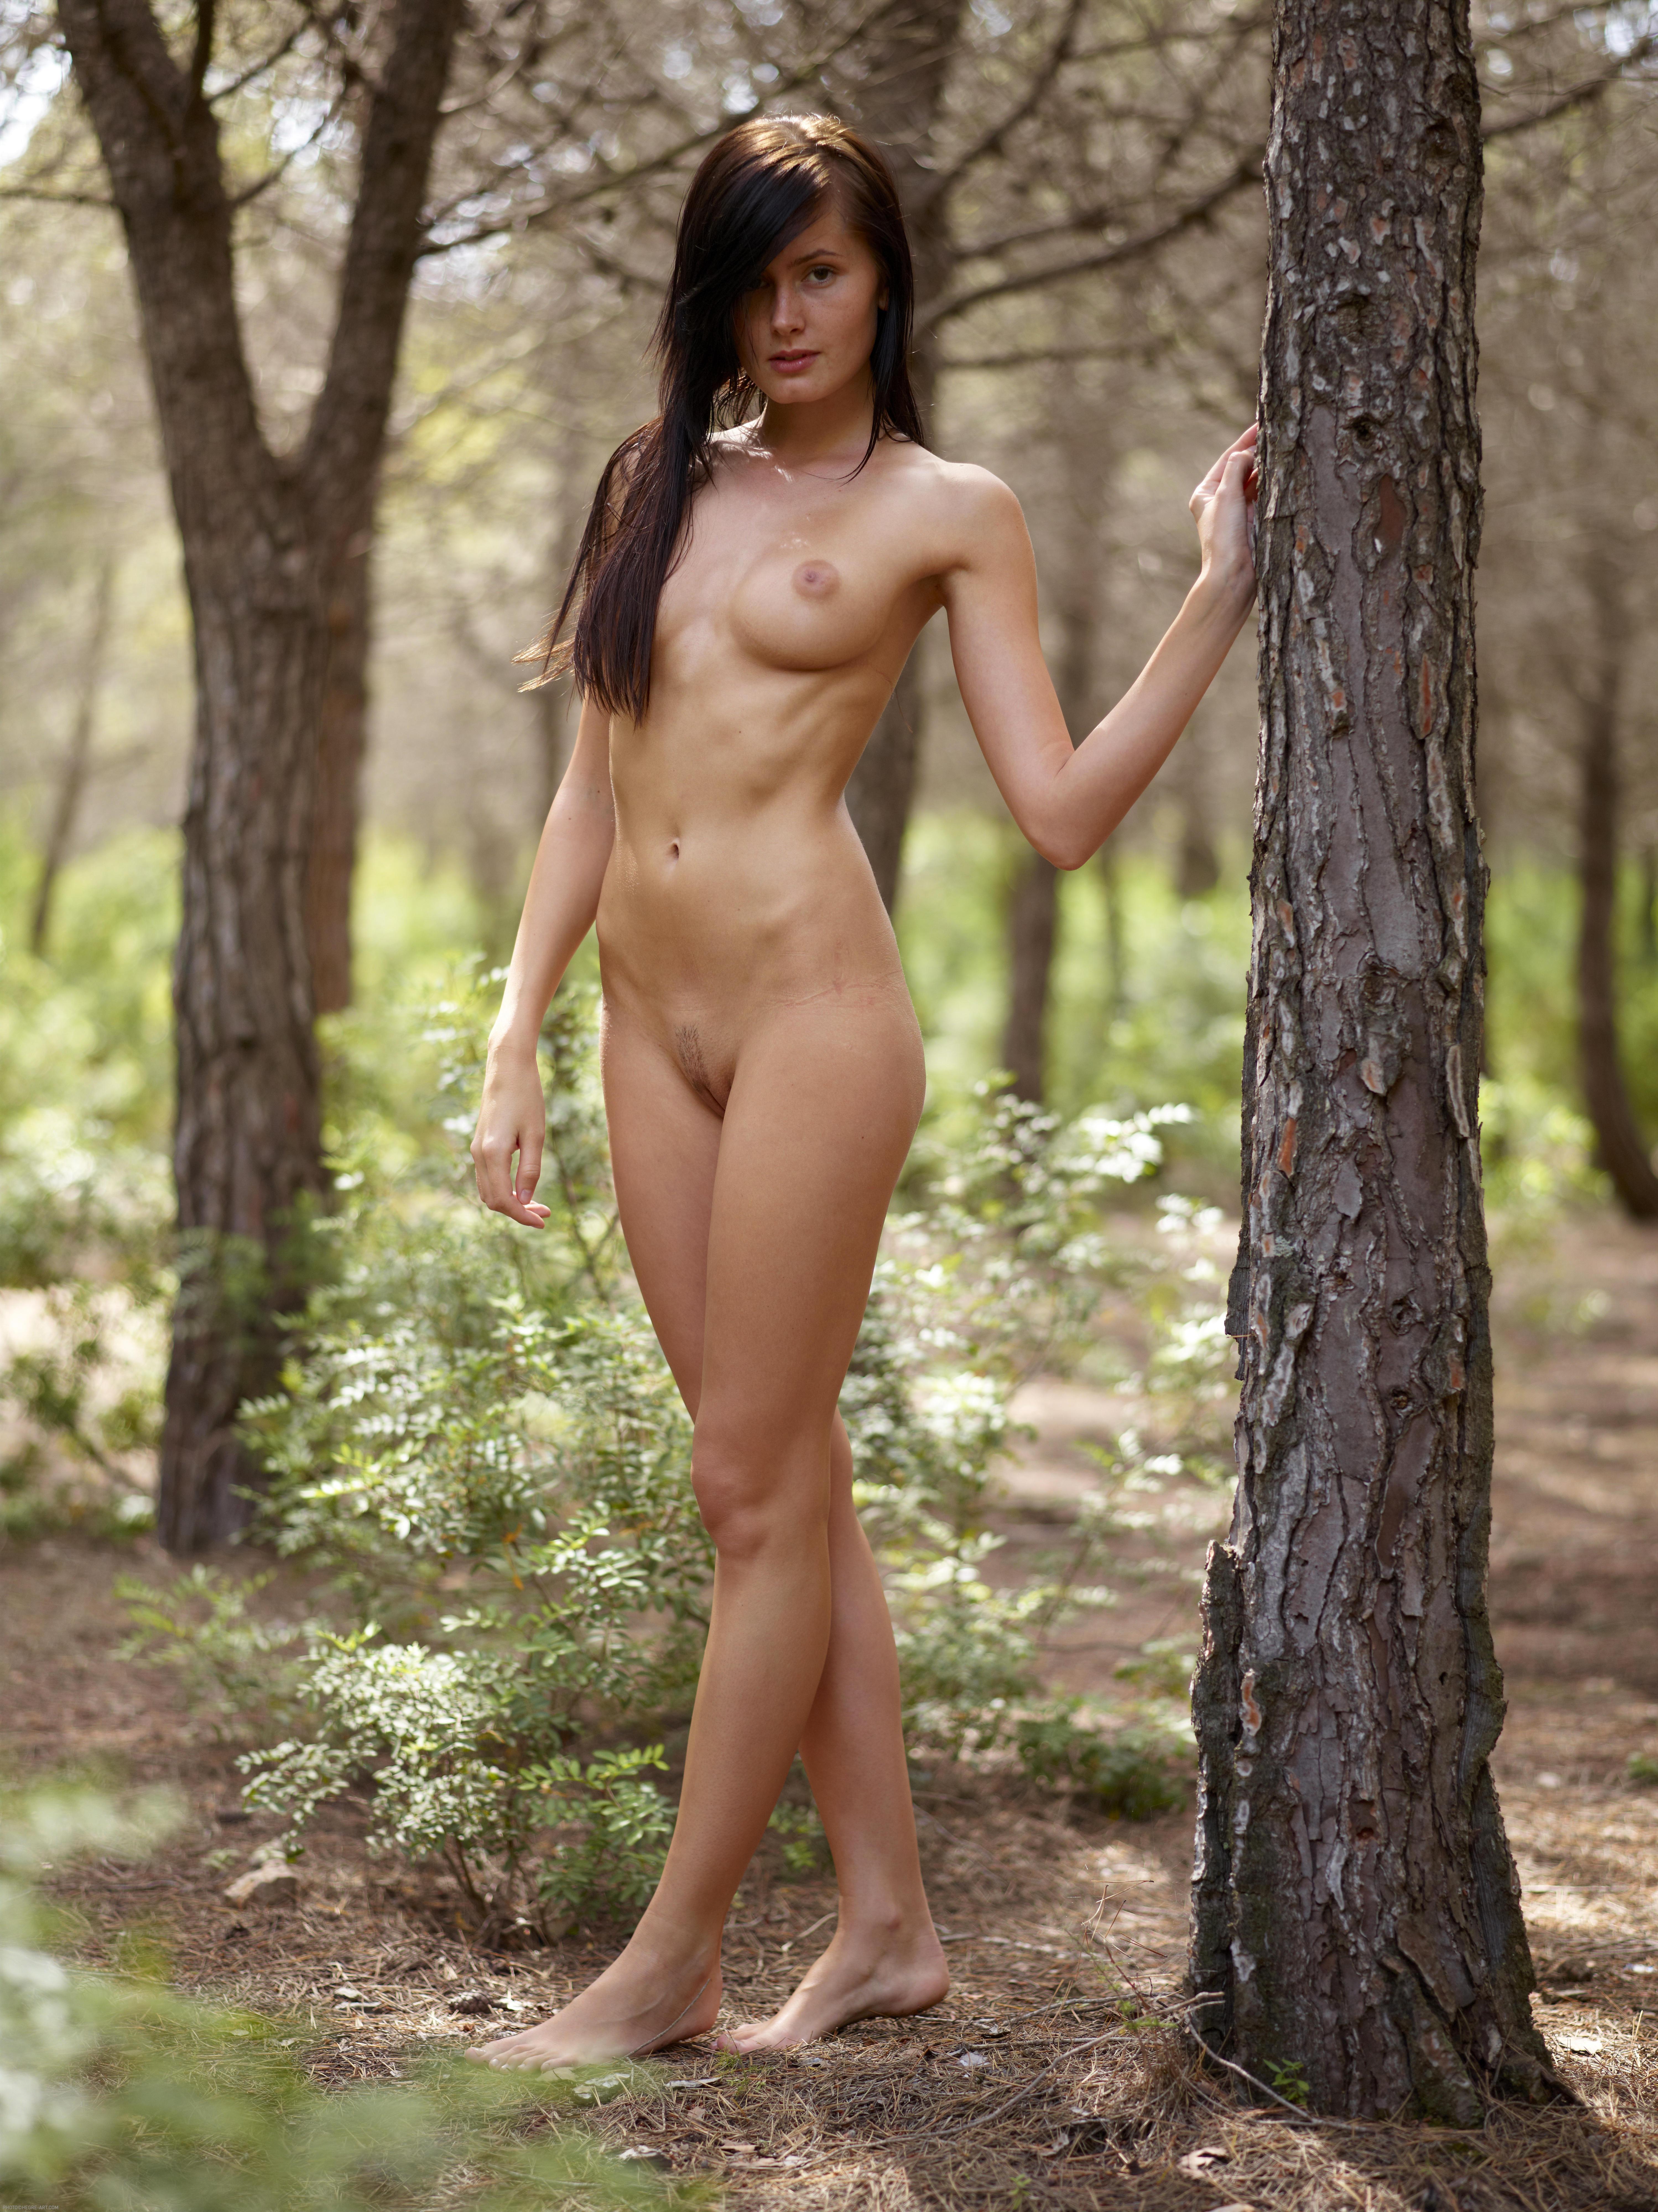 Nudism photo nudism photos nudism   inudismnaturismcom